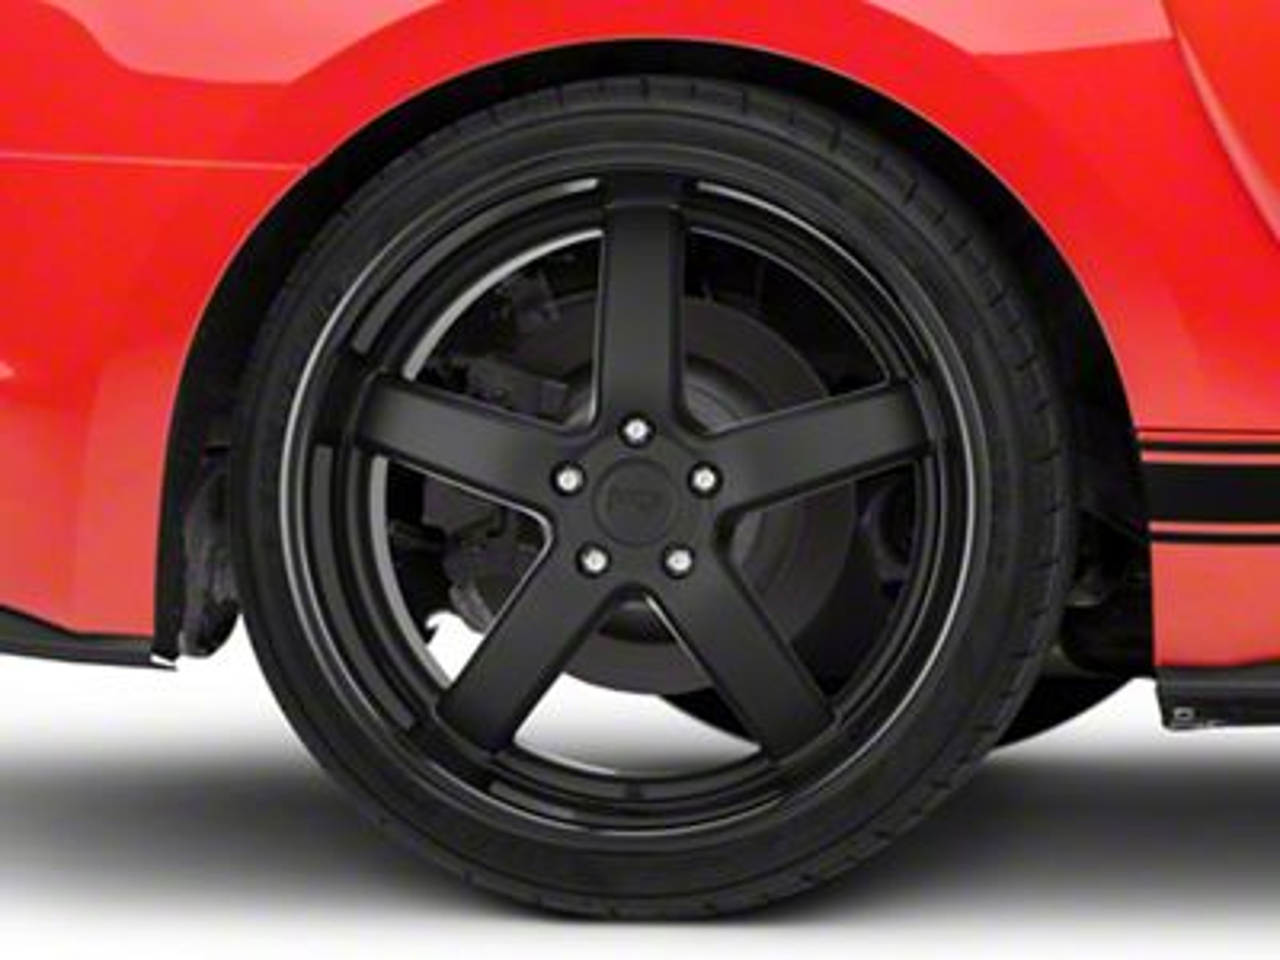 Niche Pantano Matte Black Wheel - 20x10 - Rear Only (15-19 GT, EcoBoost, V6)